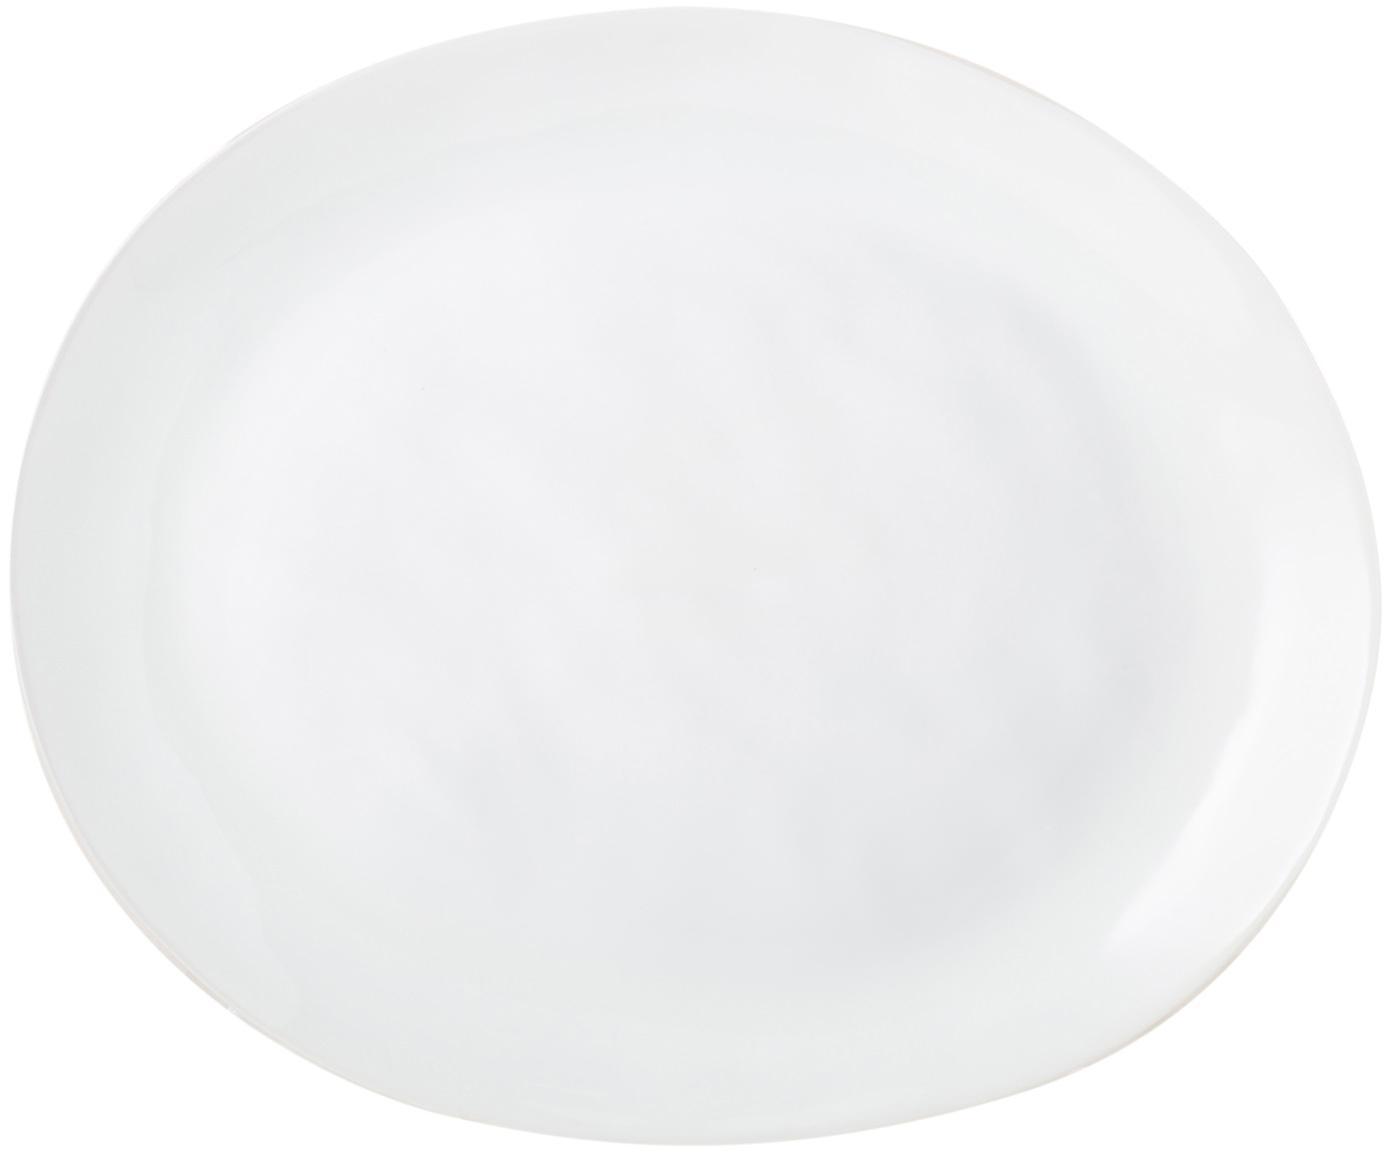 Dinerborden Porcelino, 4 stuks, Porselein, Wit, oneffen, 24 x 28 cm